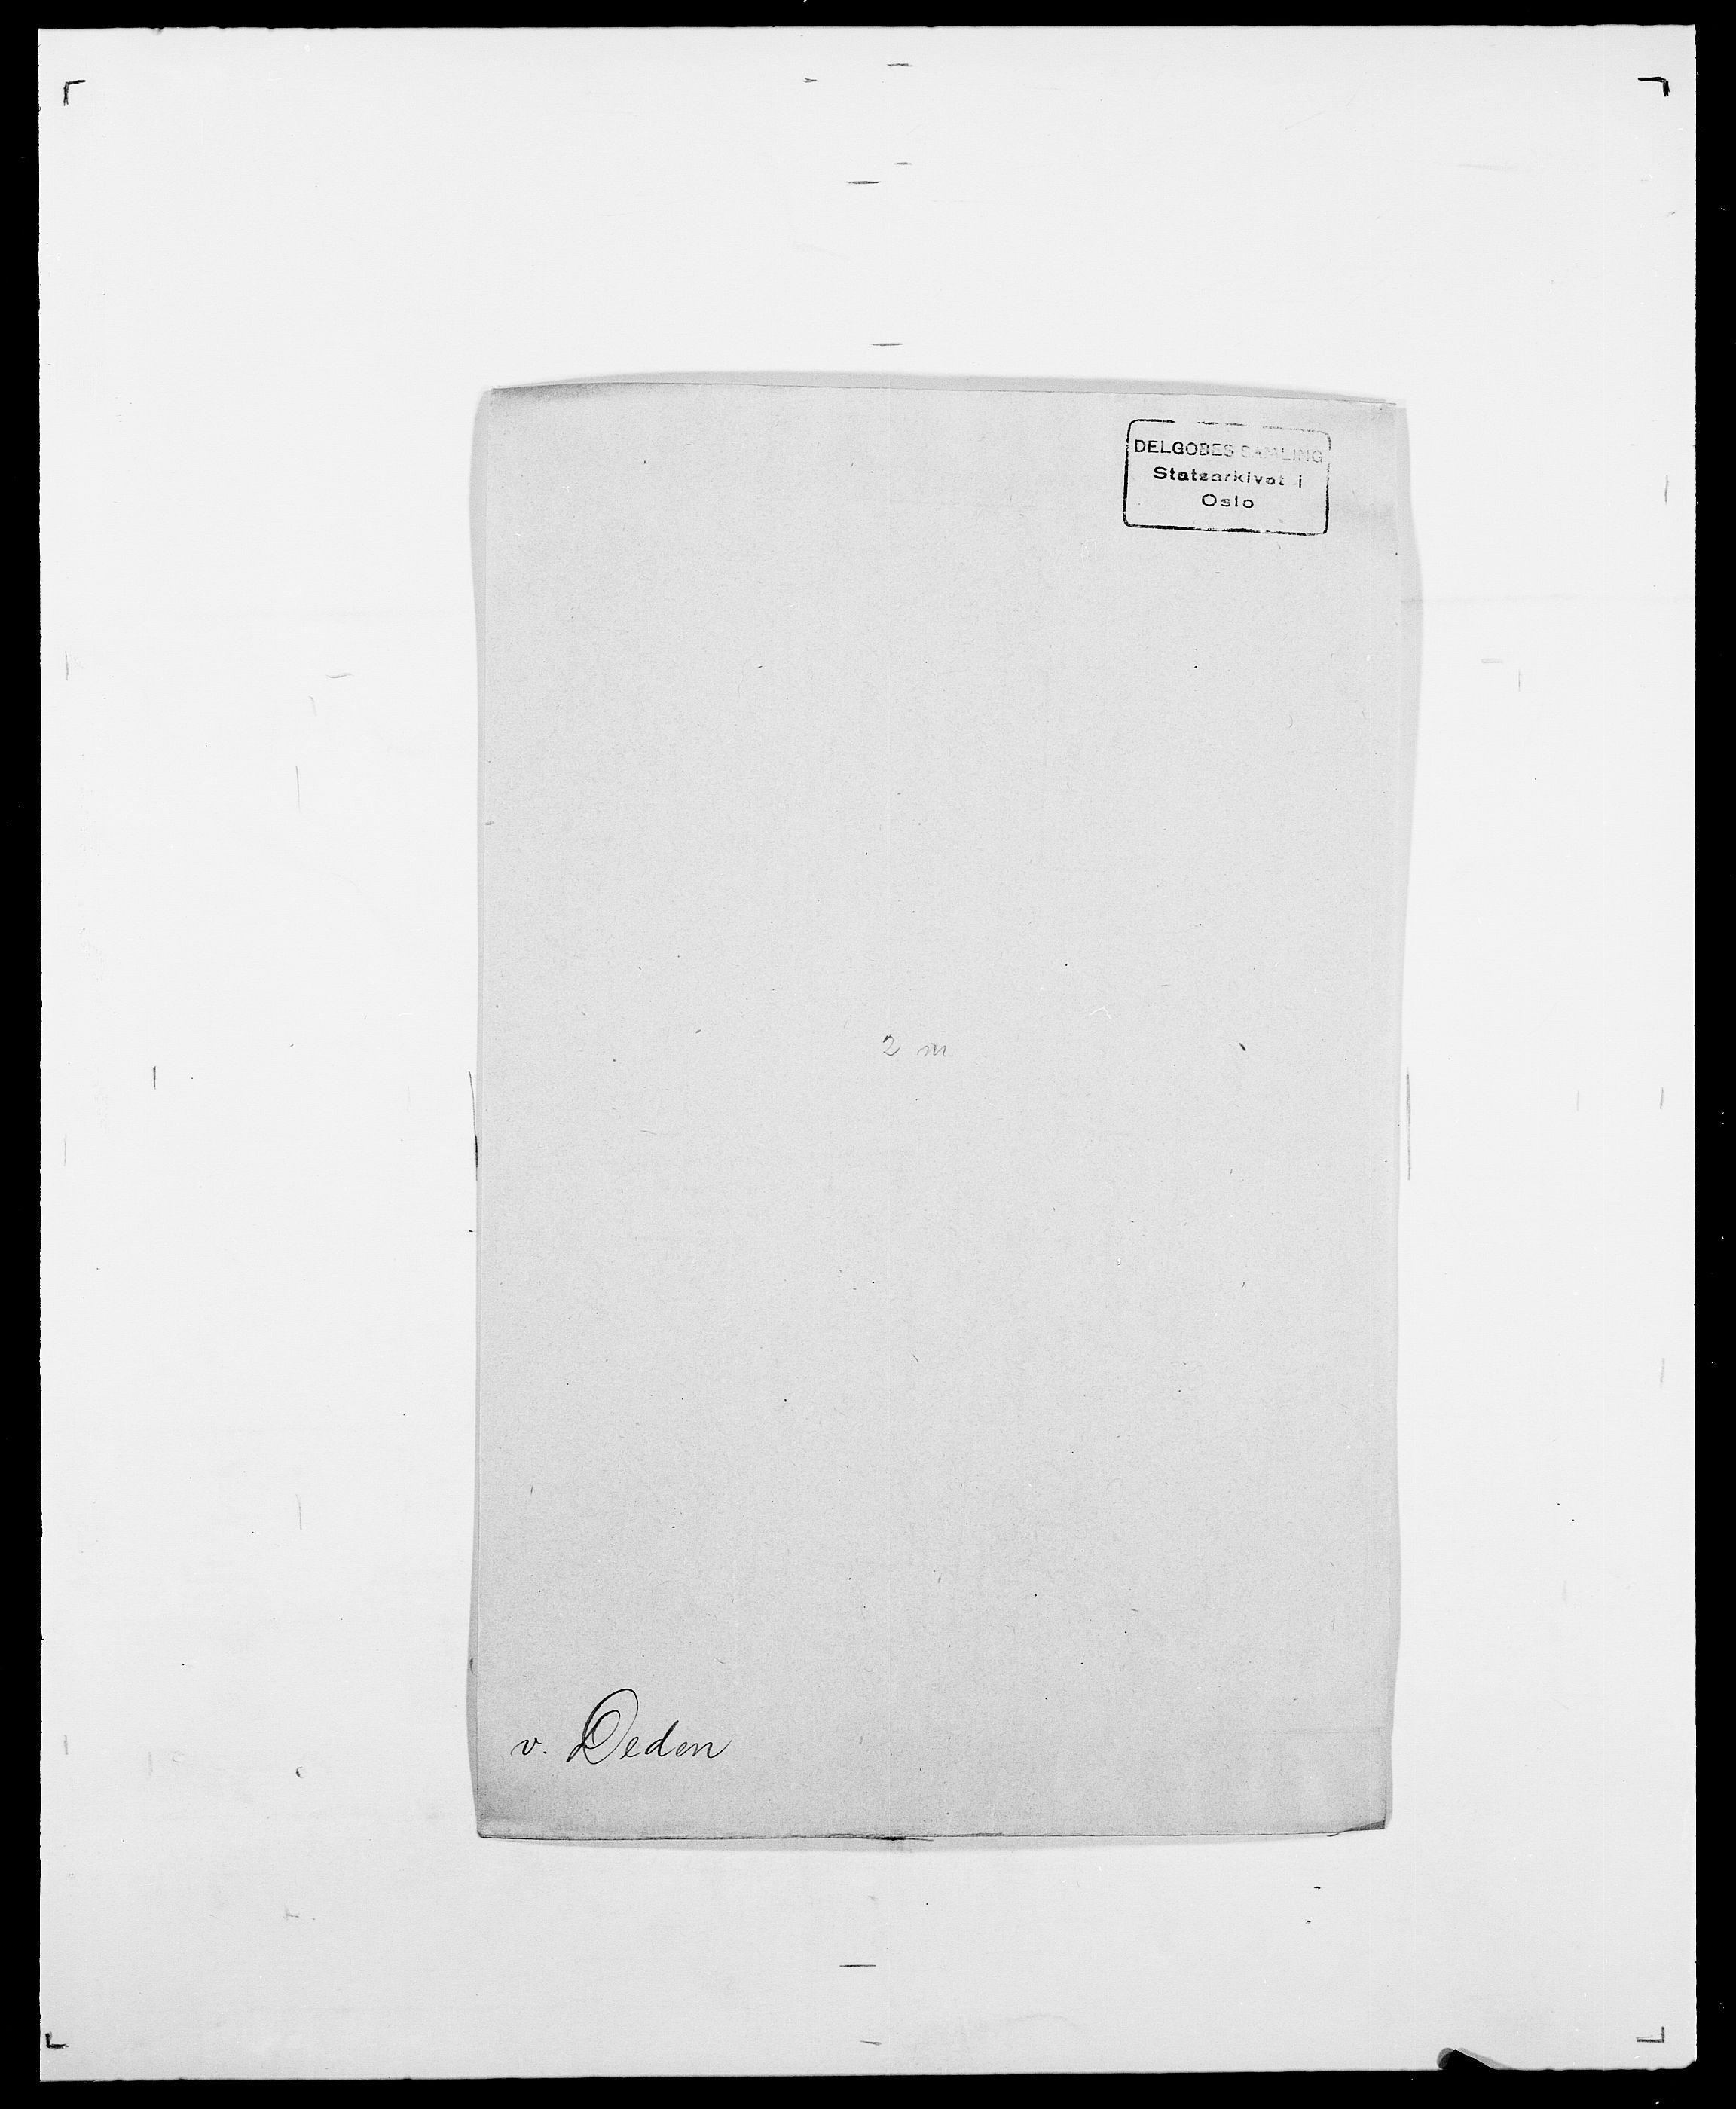 SAO, Delgobe, Charles Antoine - samling, D/Da/L0009: Dahl - v. Düren, s. 412